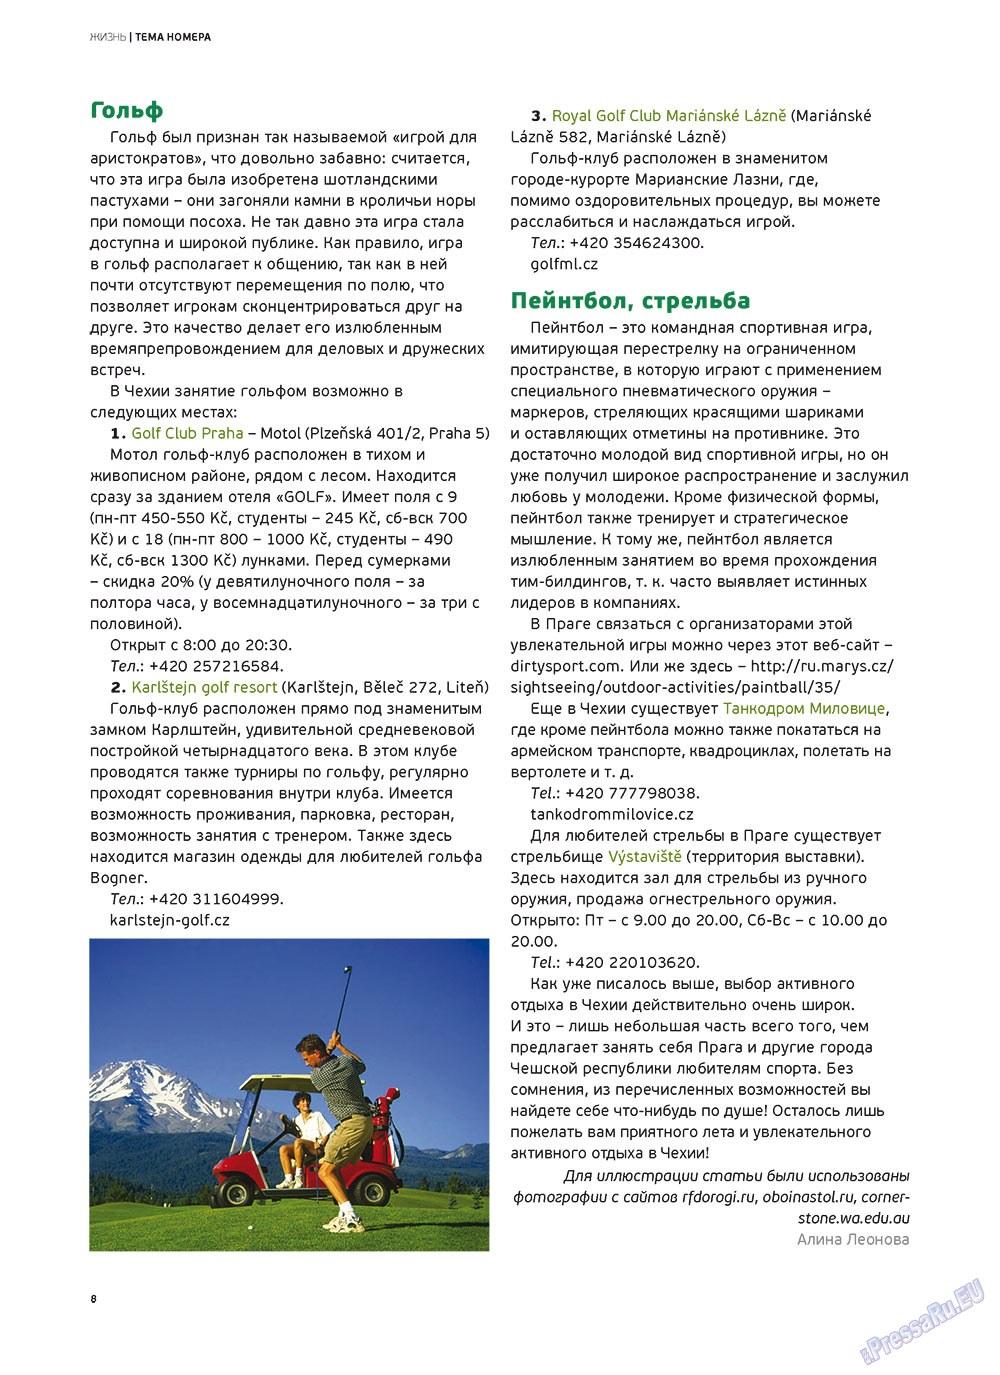 Артек (журнал). 2012 год, номер 2, стр. 10